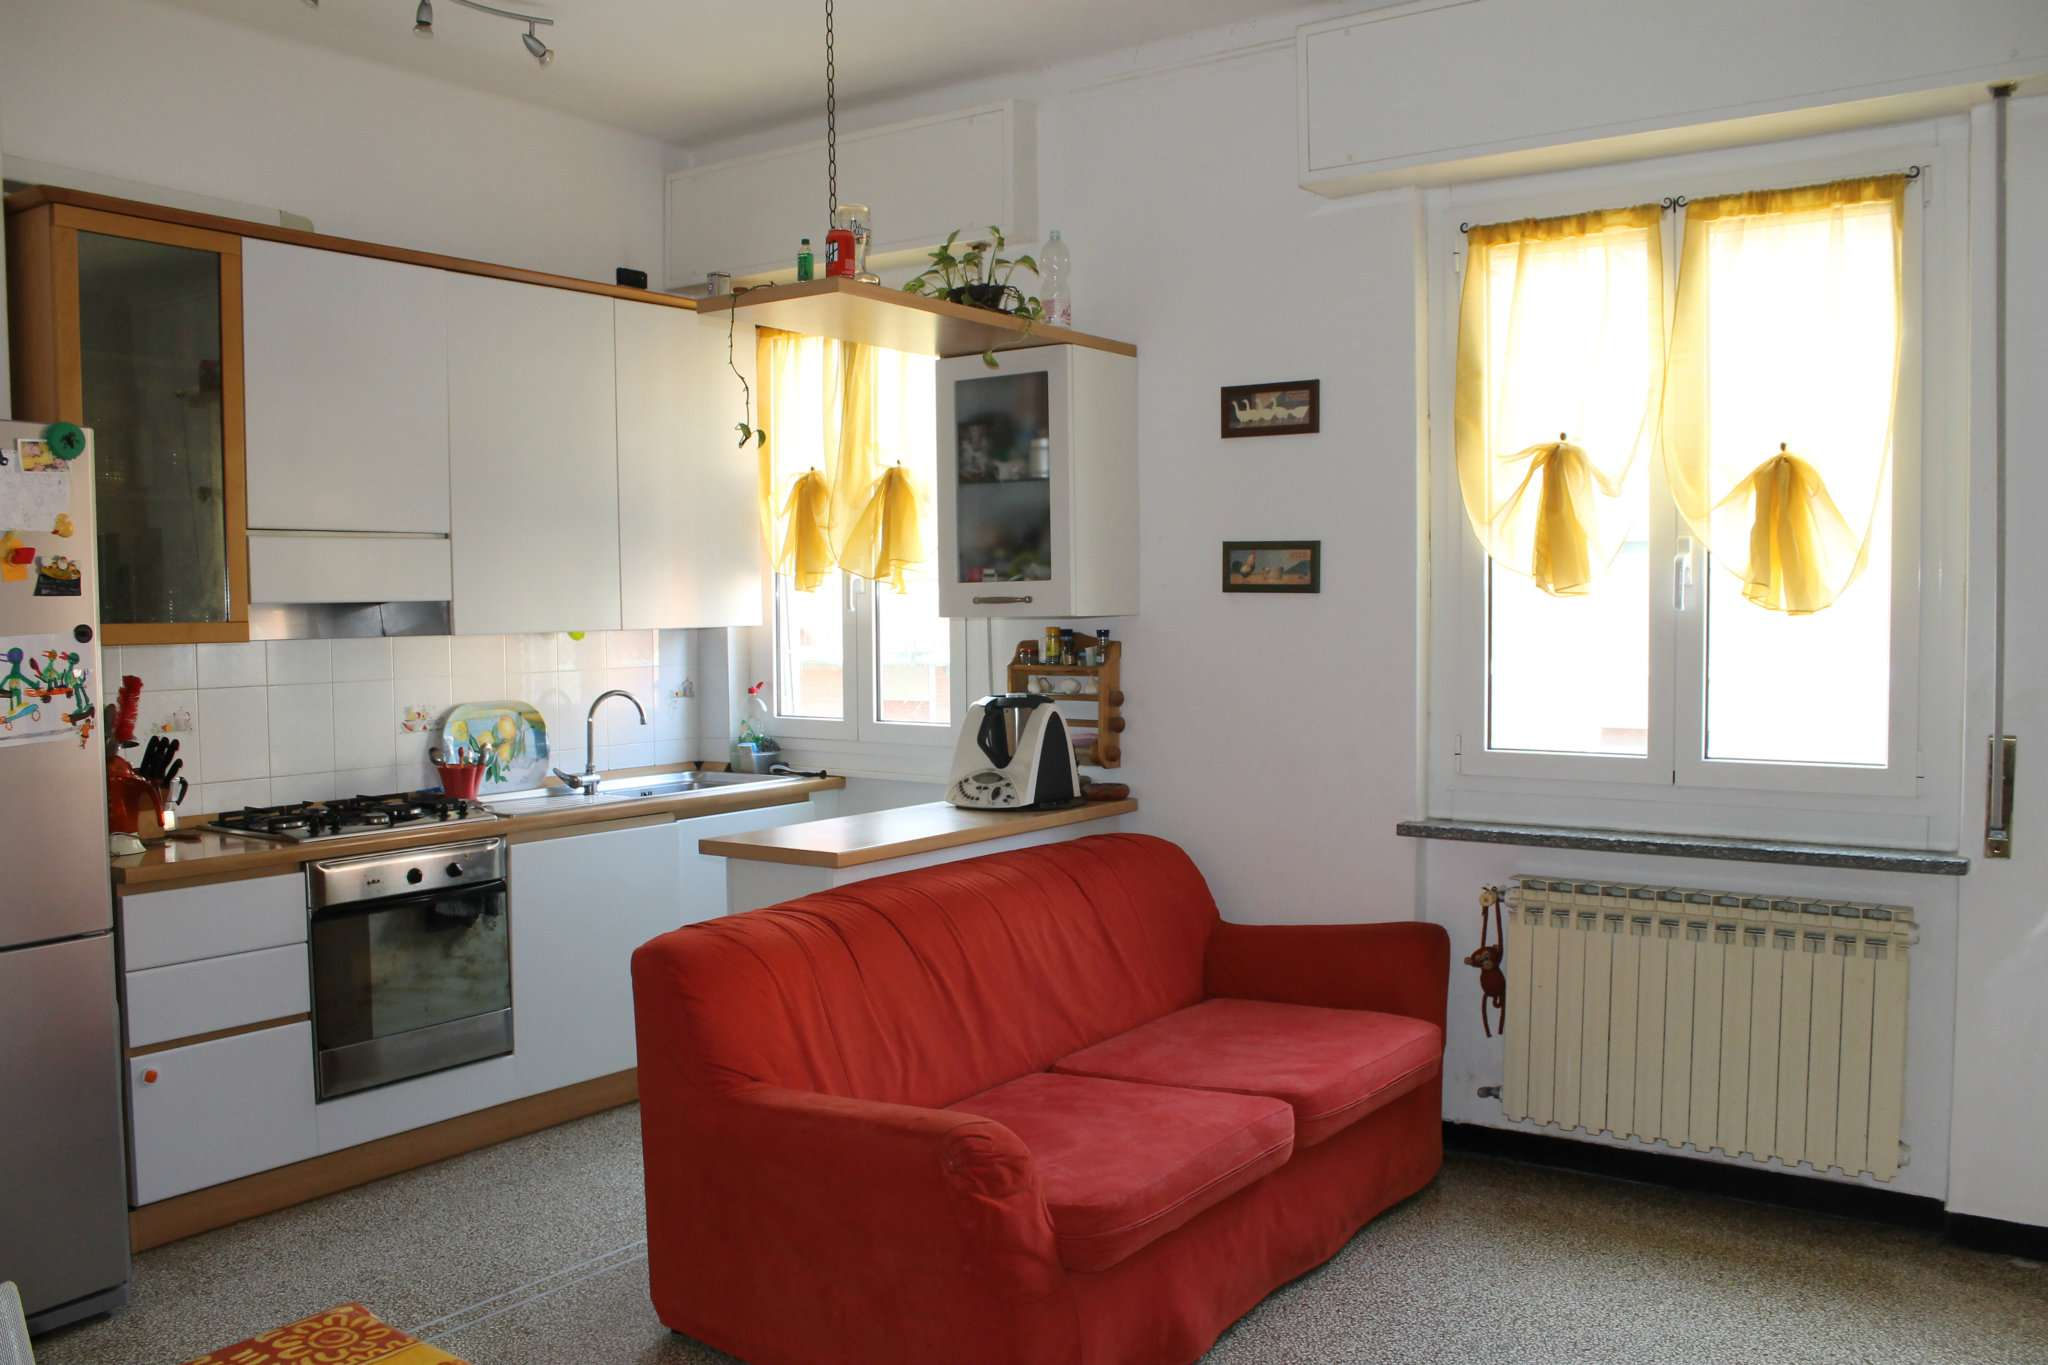 Appartamento, Arrivabene, Sestri Ponente, Vendita - Genova (Genova)